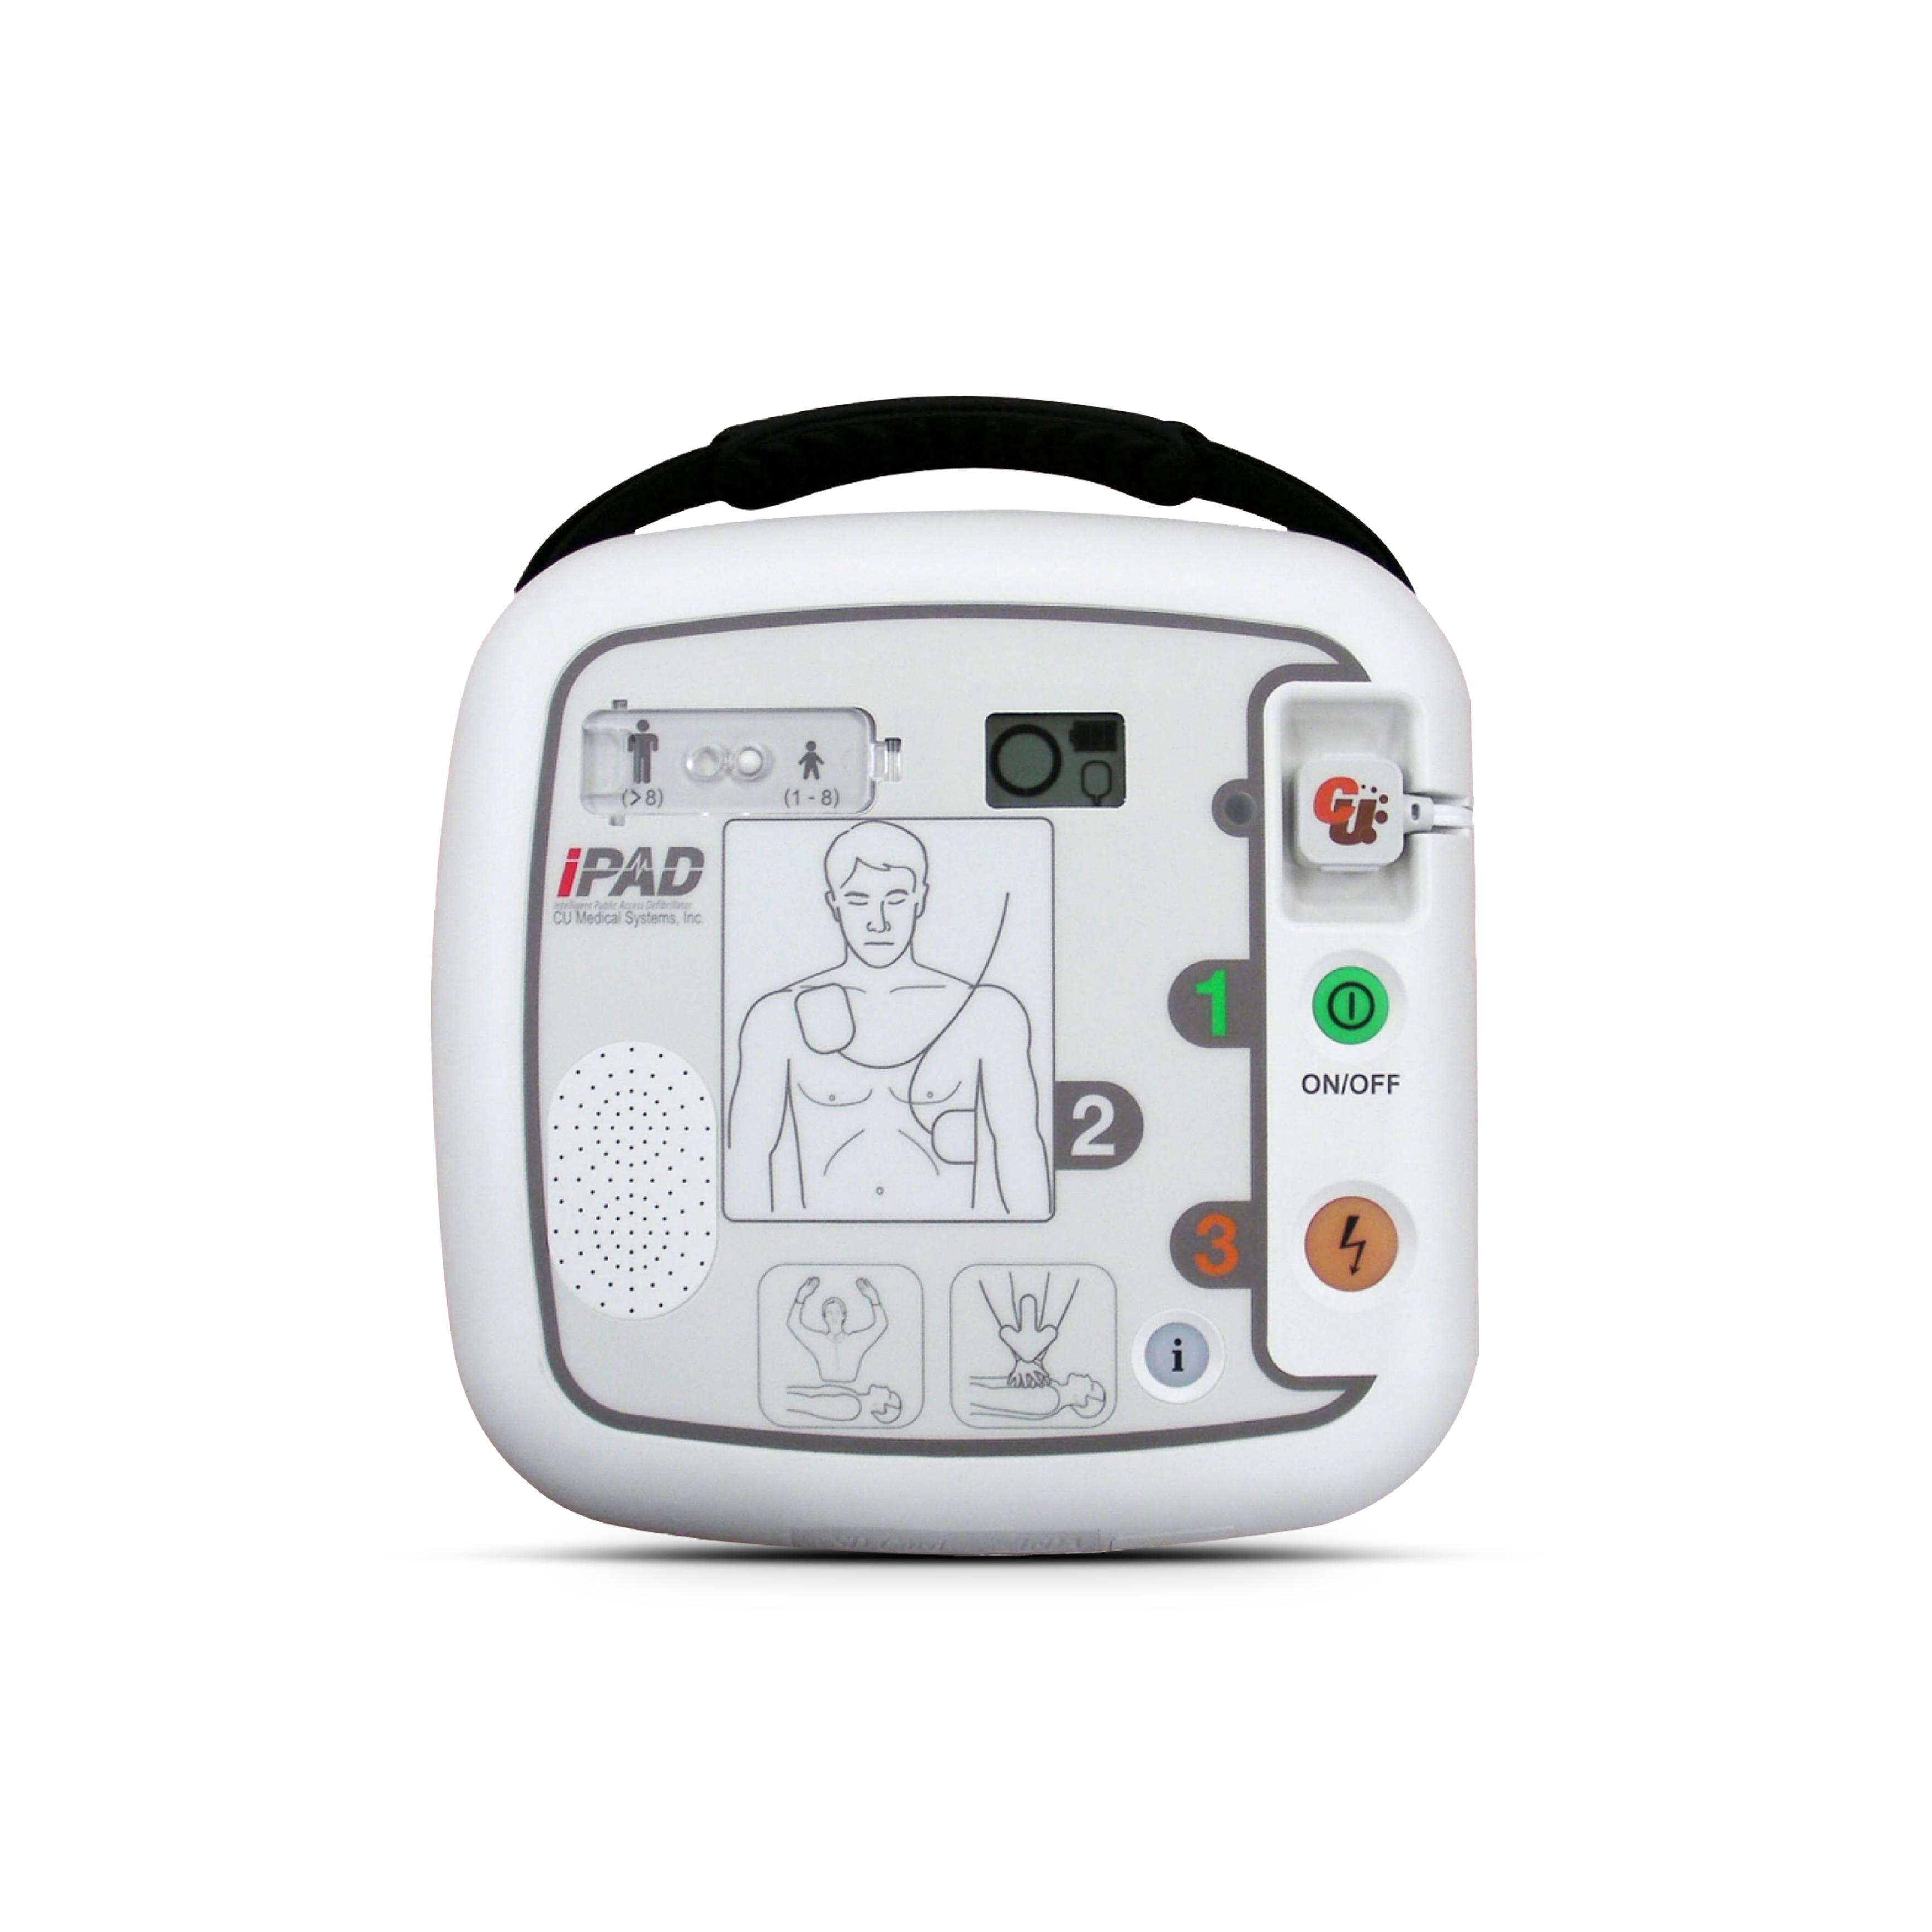 I-PAD SP1 Semi-Automatic Defibrillator